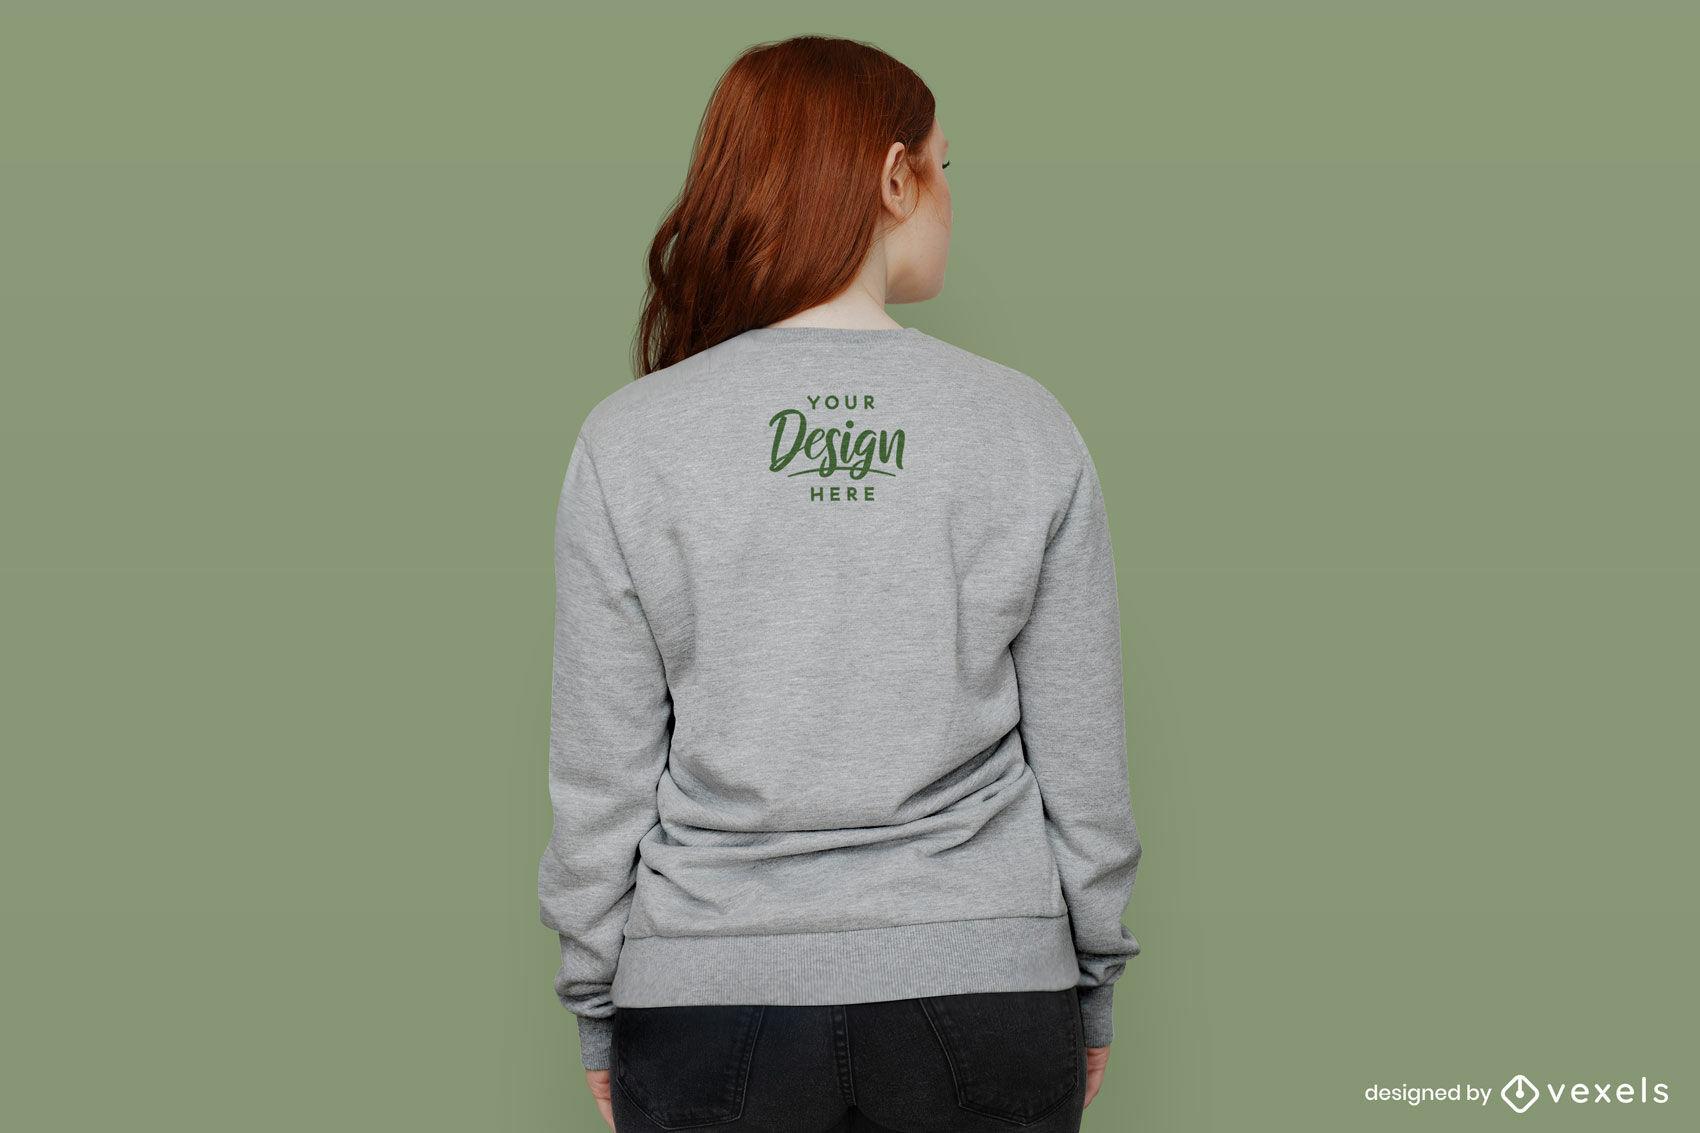 Girl with grey sweatshirt from behind mockup